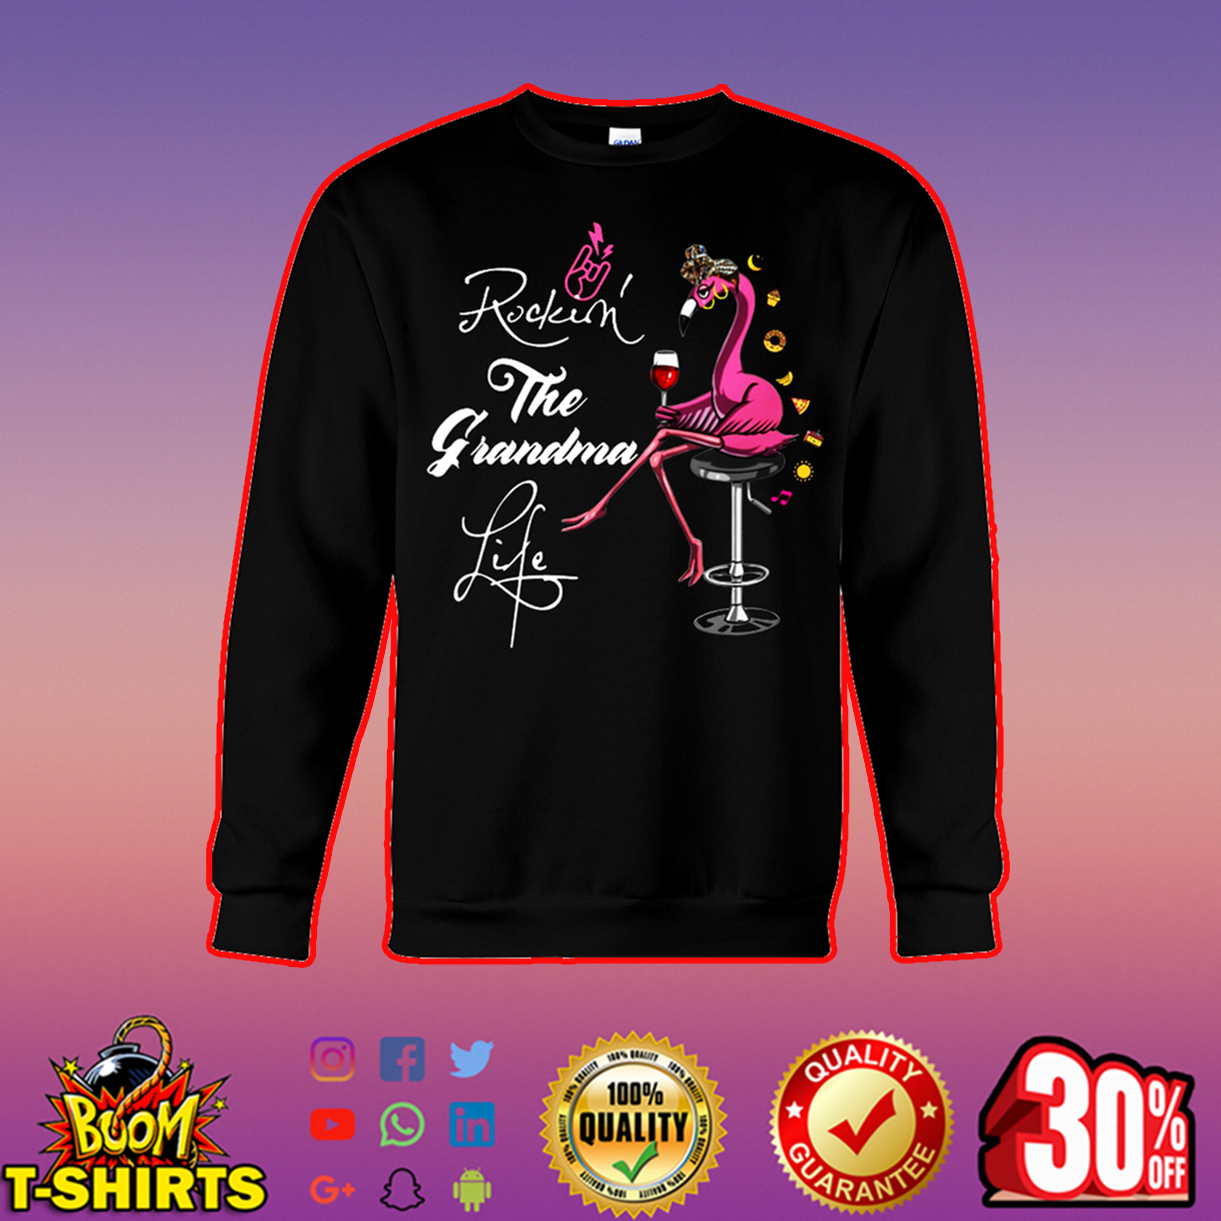 Flamingo rockin' the grandma life sweatshirt